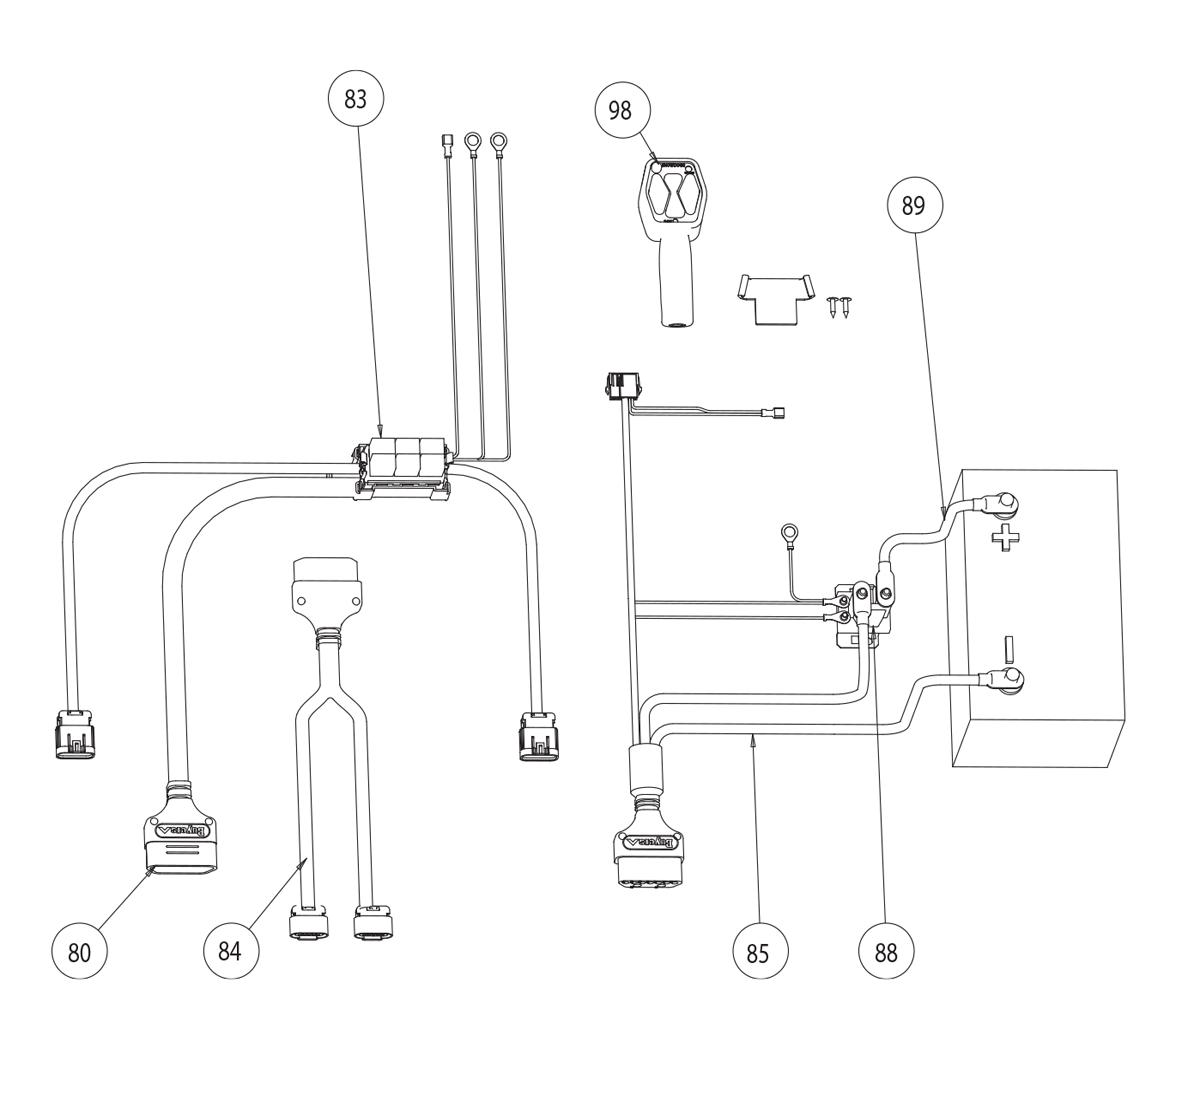 Snowdogg Plow Wiring Diagram Trusted Diagrams M75 Harness Ex 80 Free Vehicle U2022 Meyer Dodge